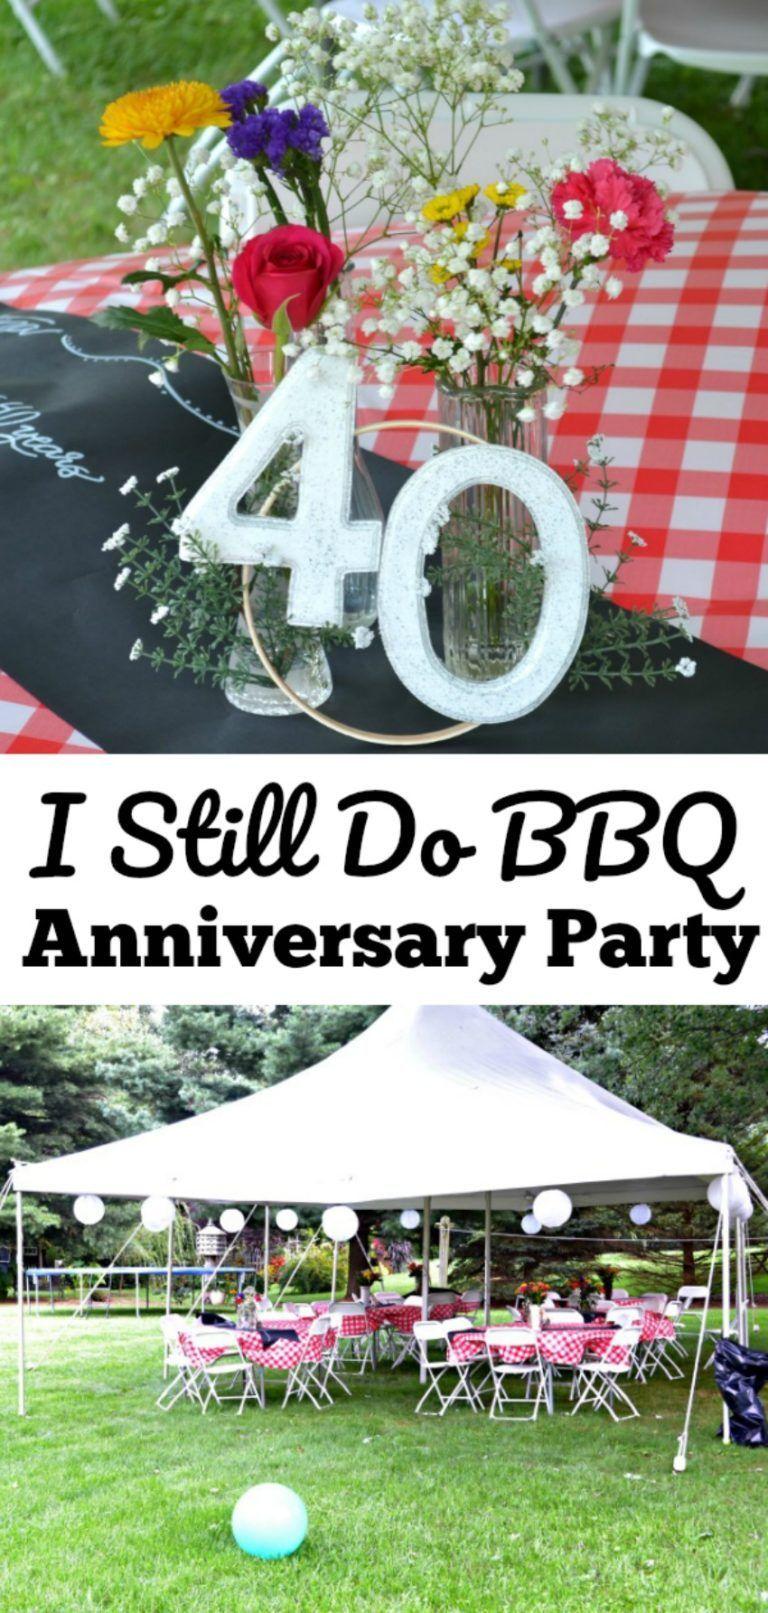 Surprise Anniversary Party Ideas {I Still Do BBQ} - #anniversary #ideas #party #still #surprise - #PartyIdea